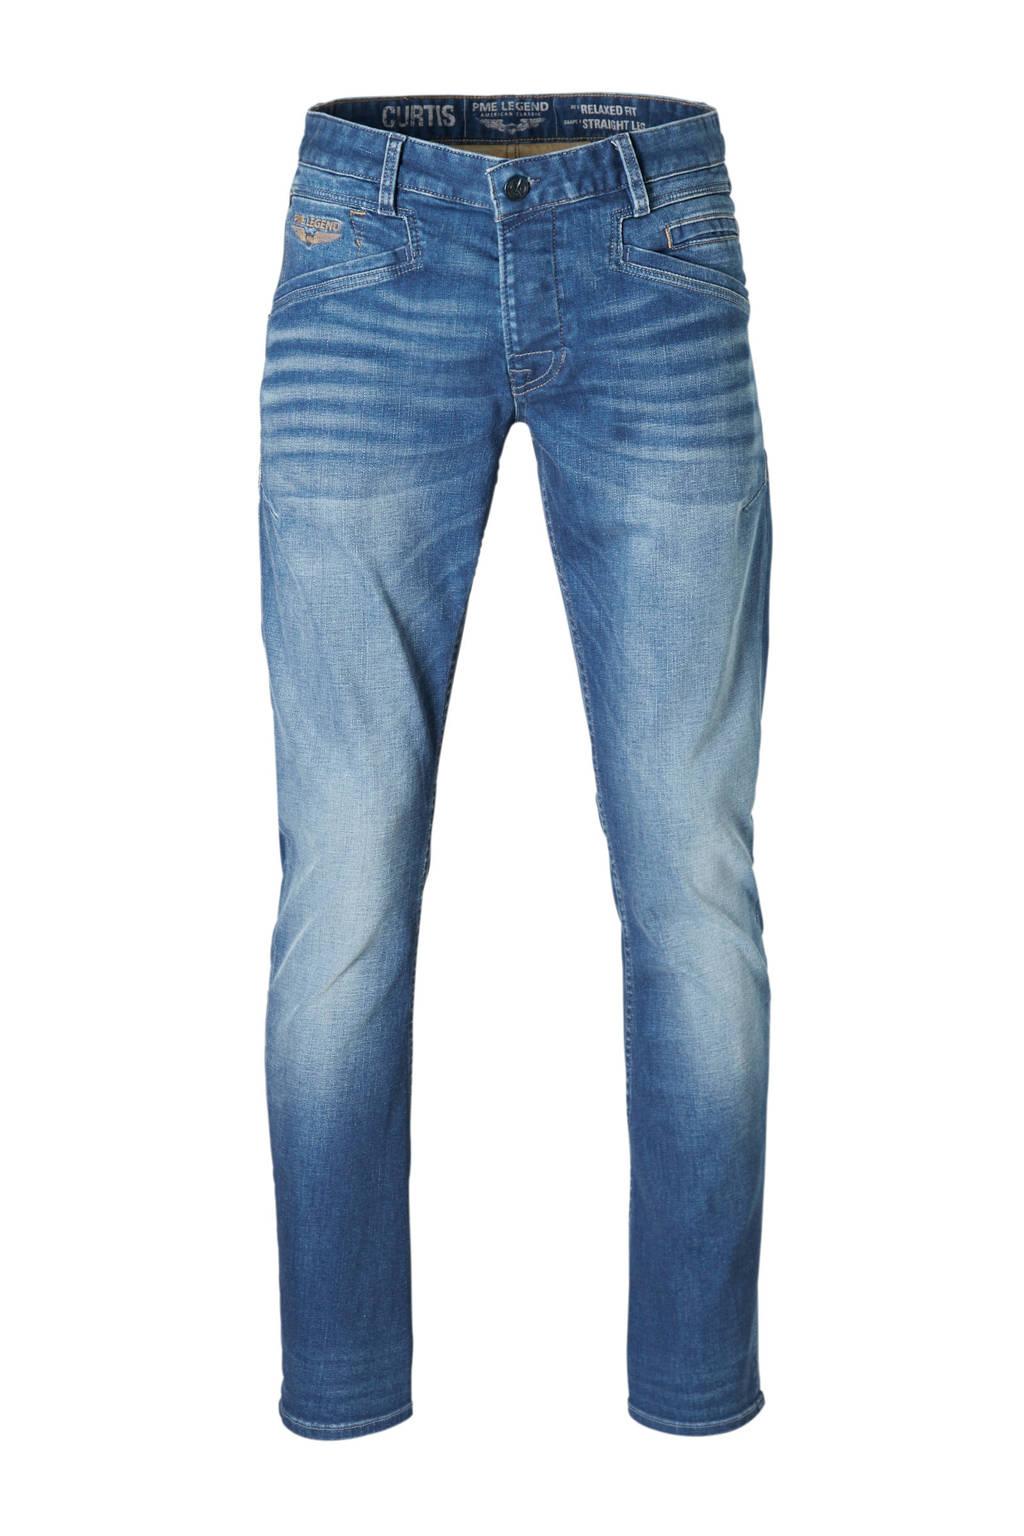 PME Legend straight fit jeans Curtis, Mid blue